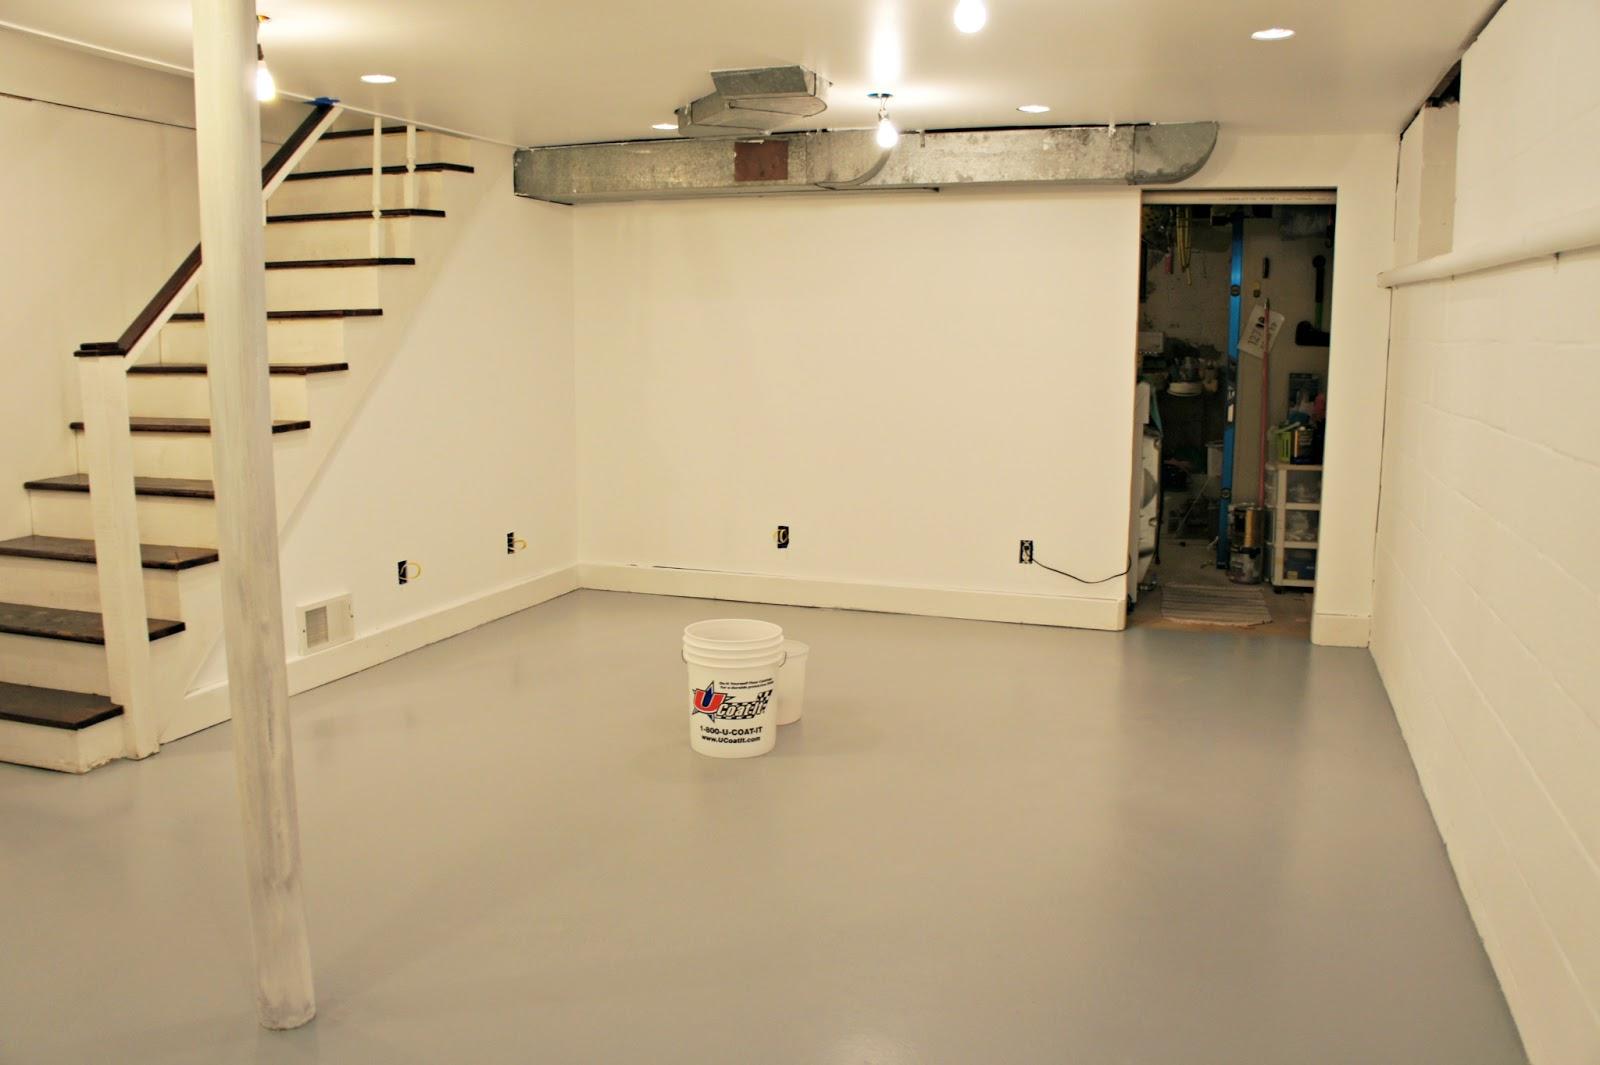 Best Paint For Basement Floor (View 7 of 10)